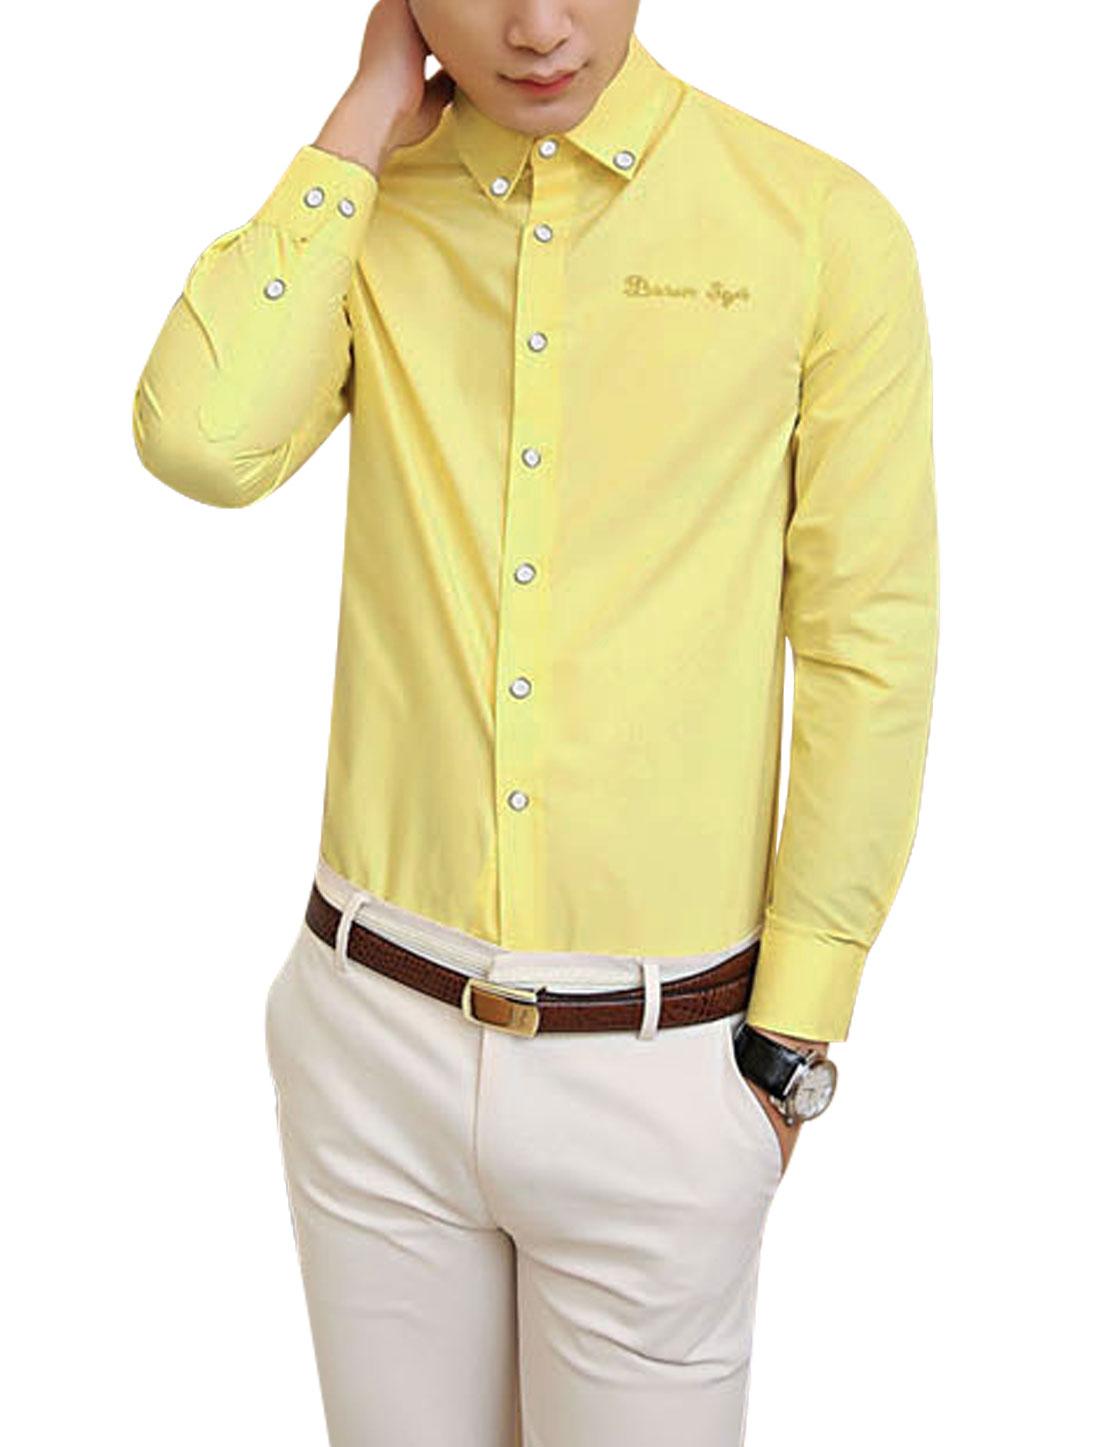 Men New Style Full Sleeve Button Cuffs Leisure Yellow Shirt M